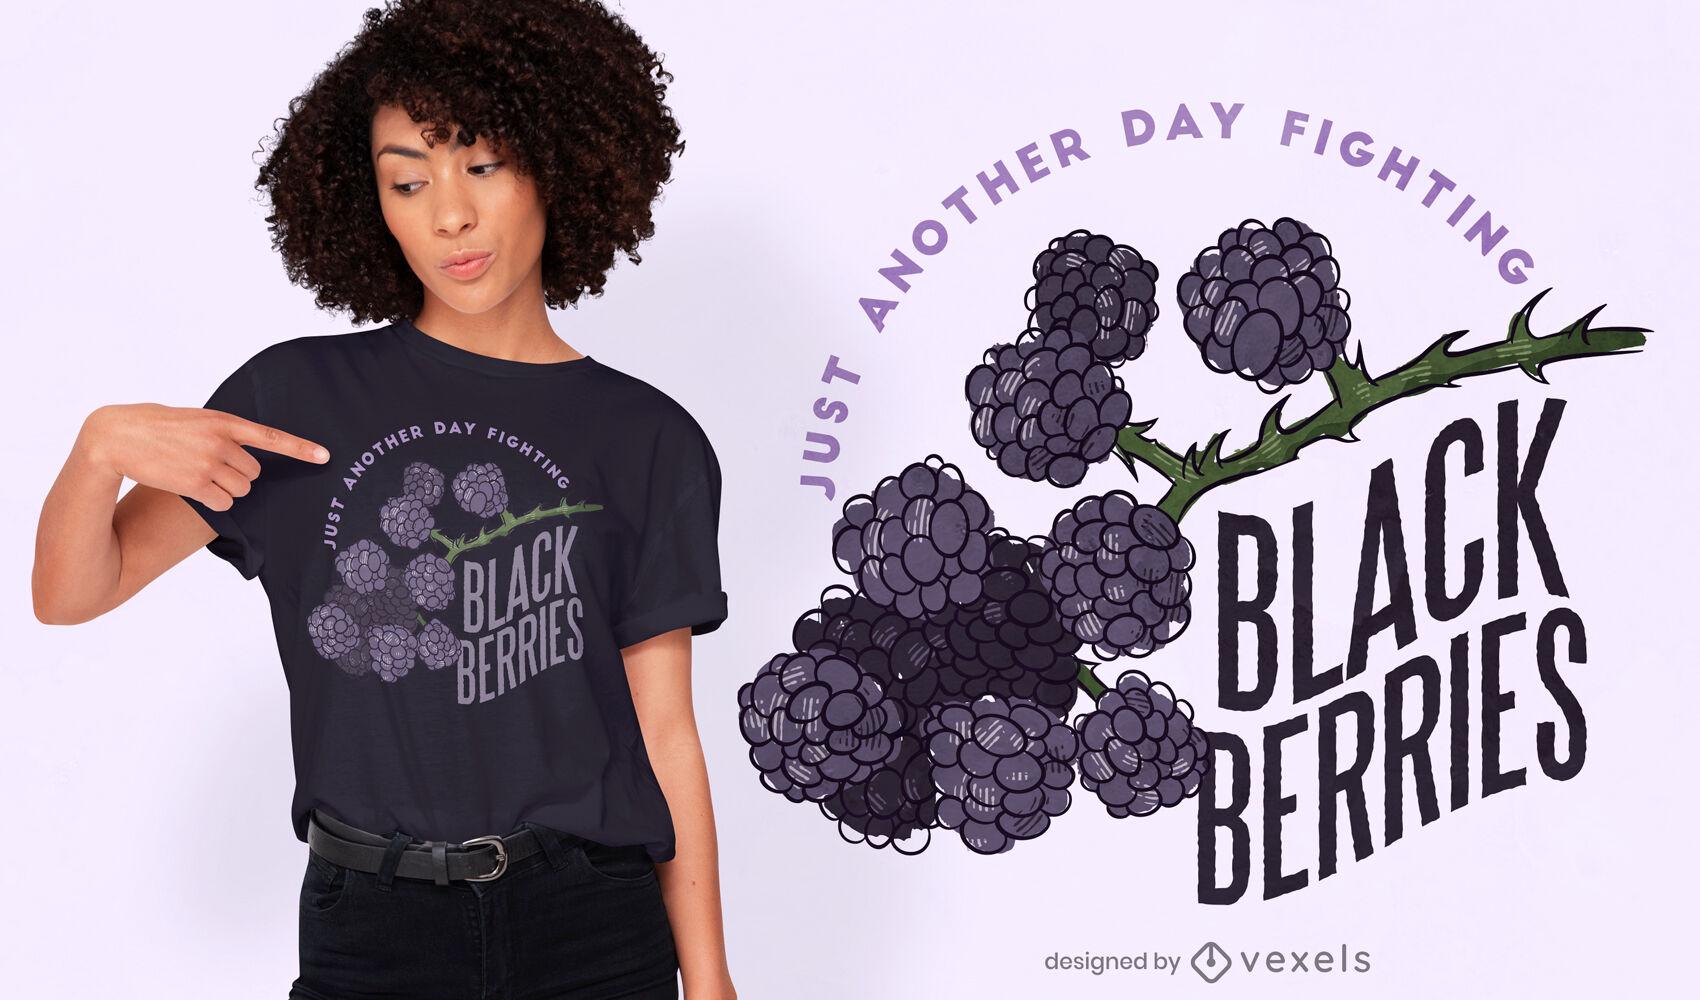 Diseño de camiseta Cool Fight Black berries